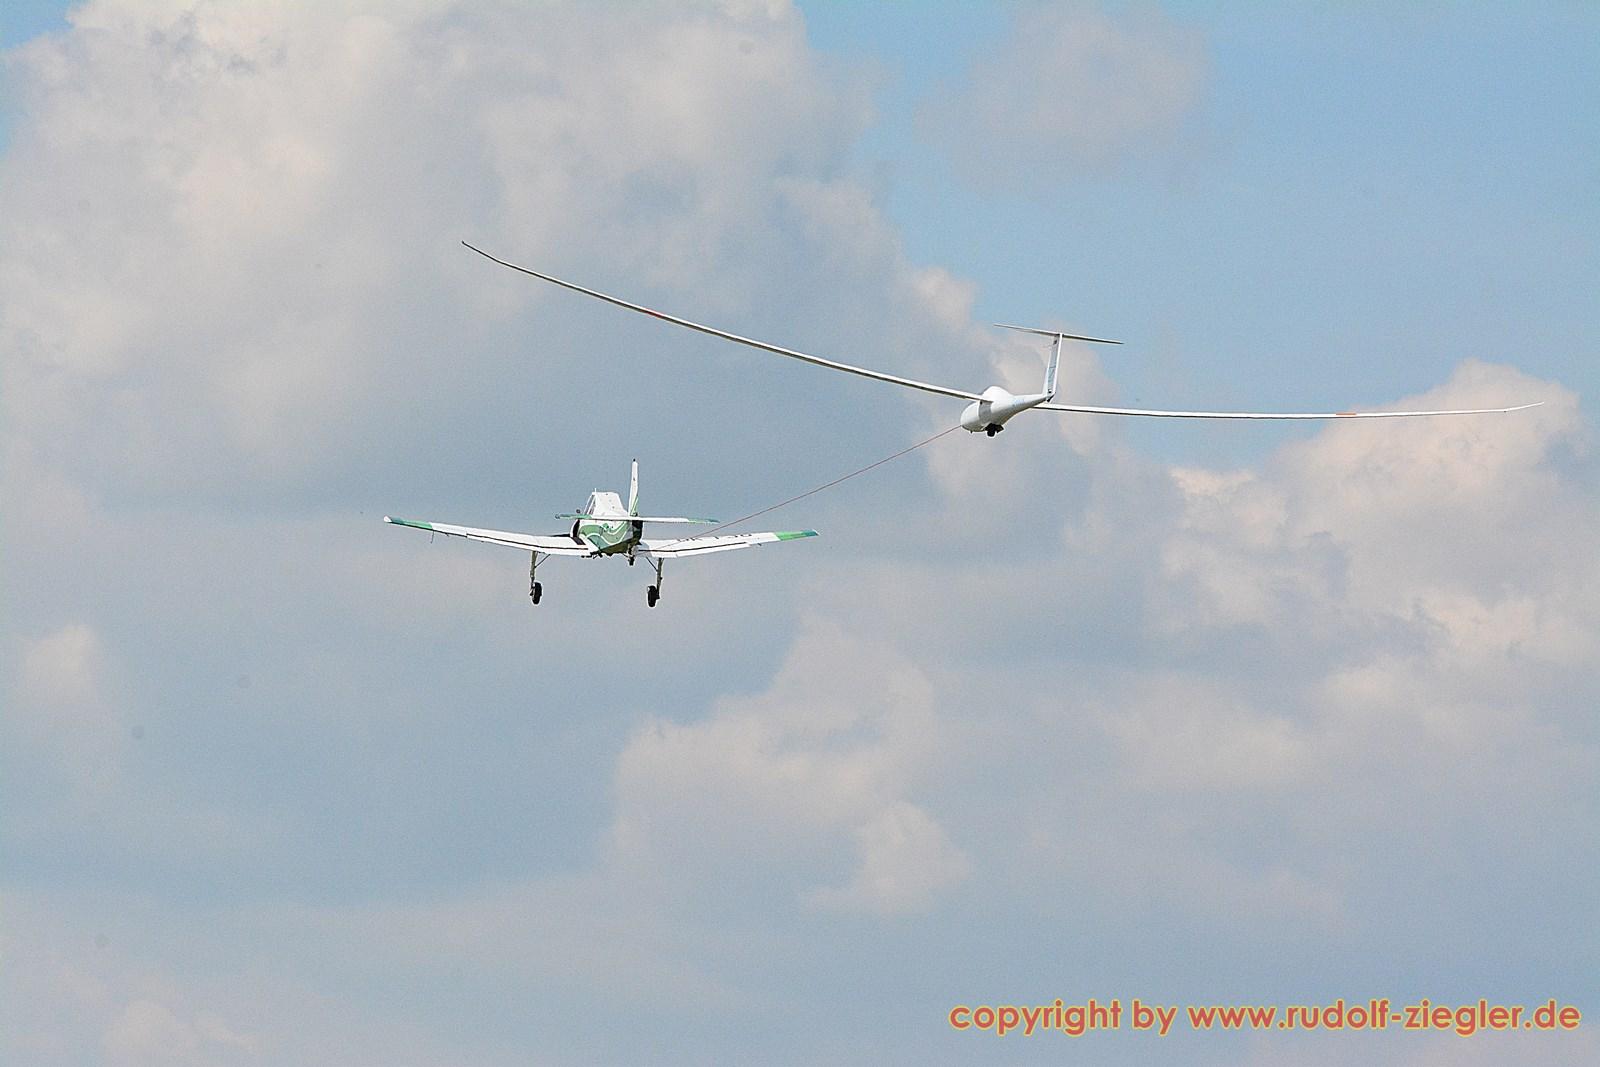 Bayerische Segelflugmeisterschaften - Flugplatz Bindlach 149-S (1600x1200)